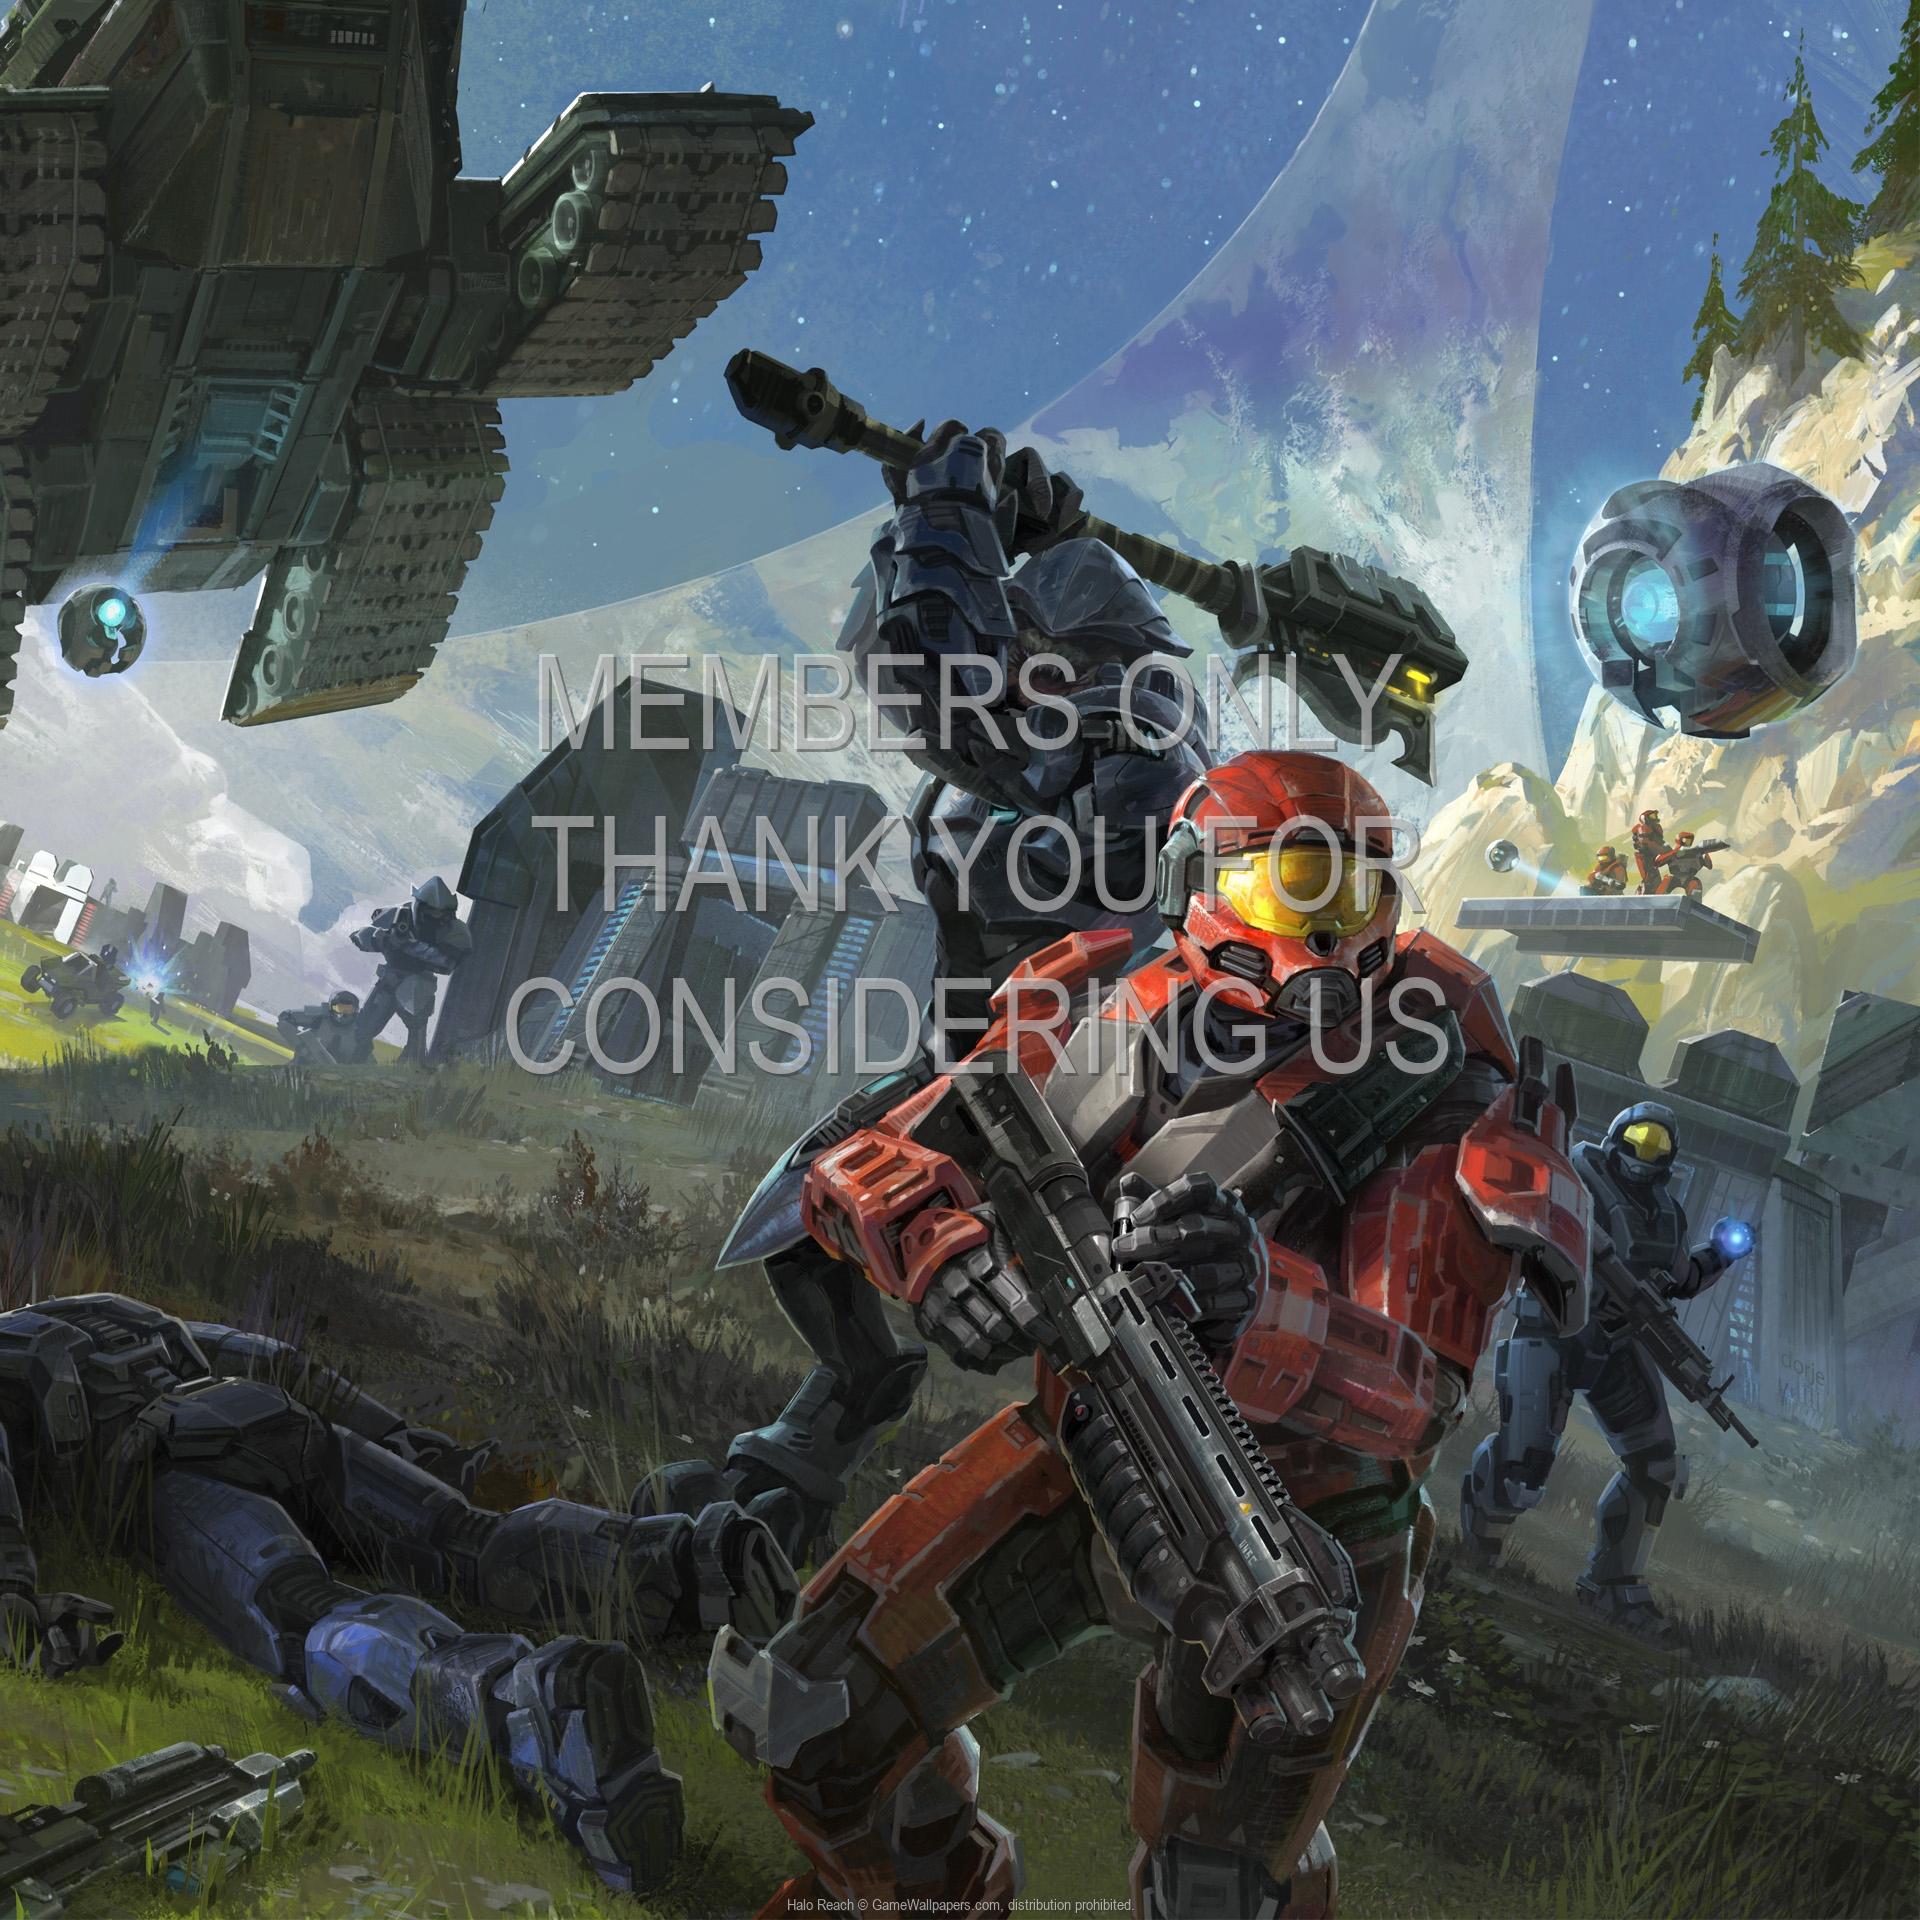 Halo: Reach 1920x1080 Handy Hintergrundbild 05